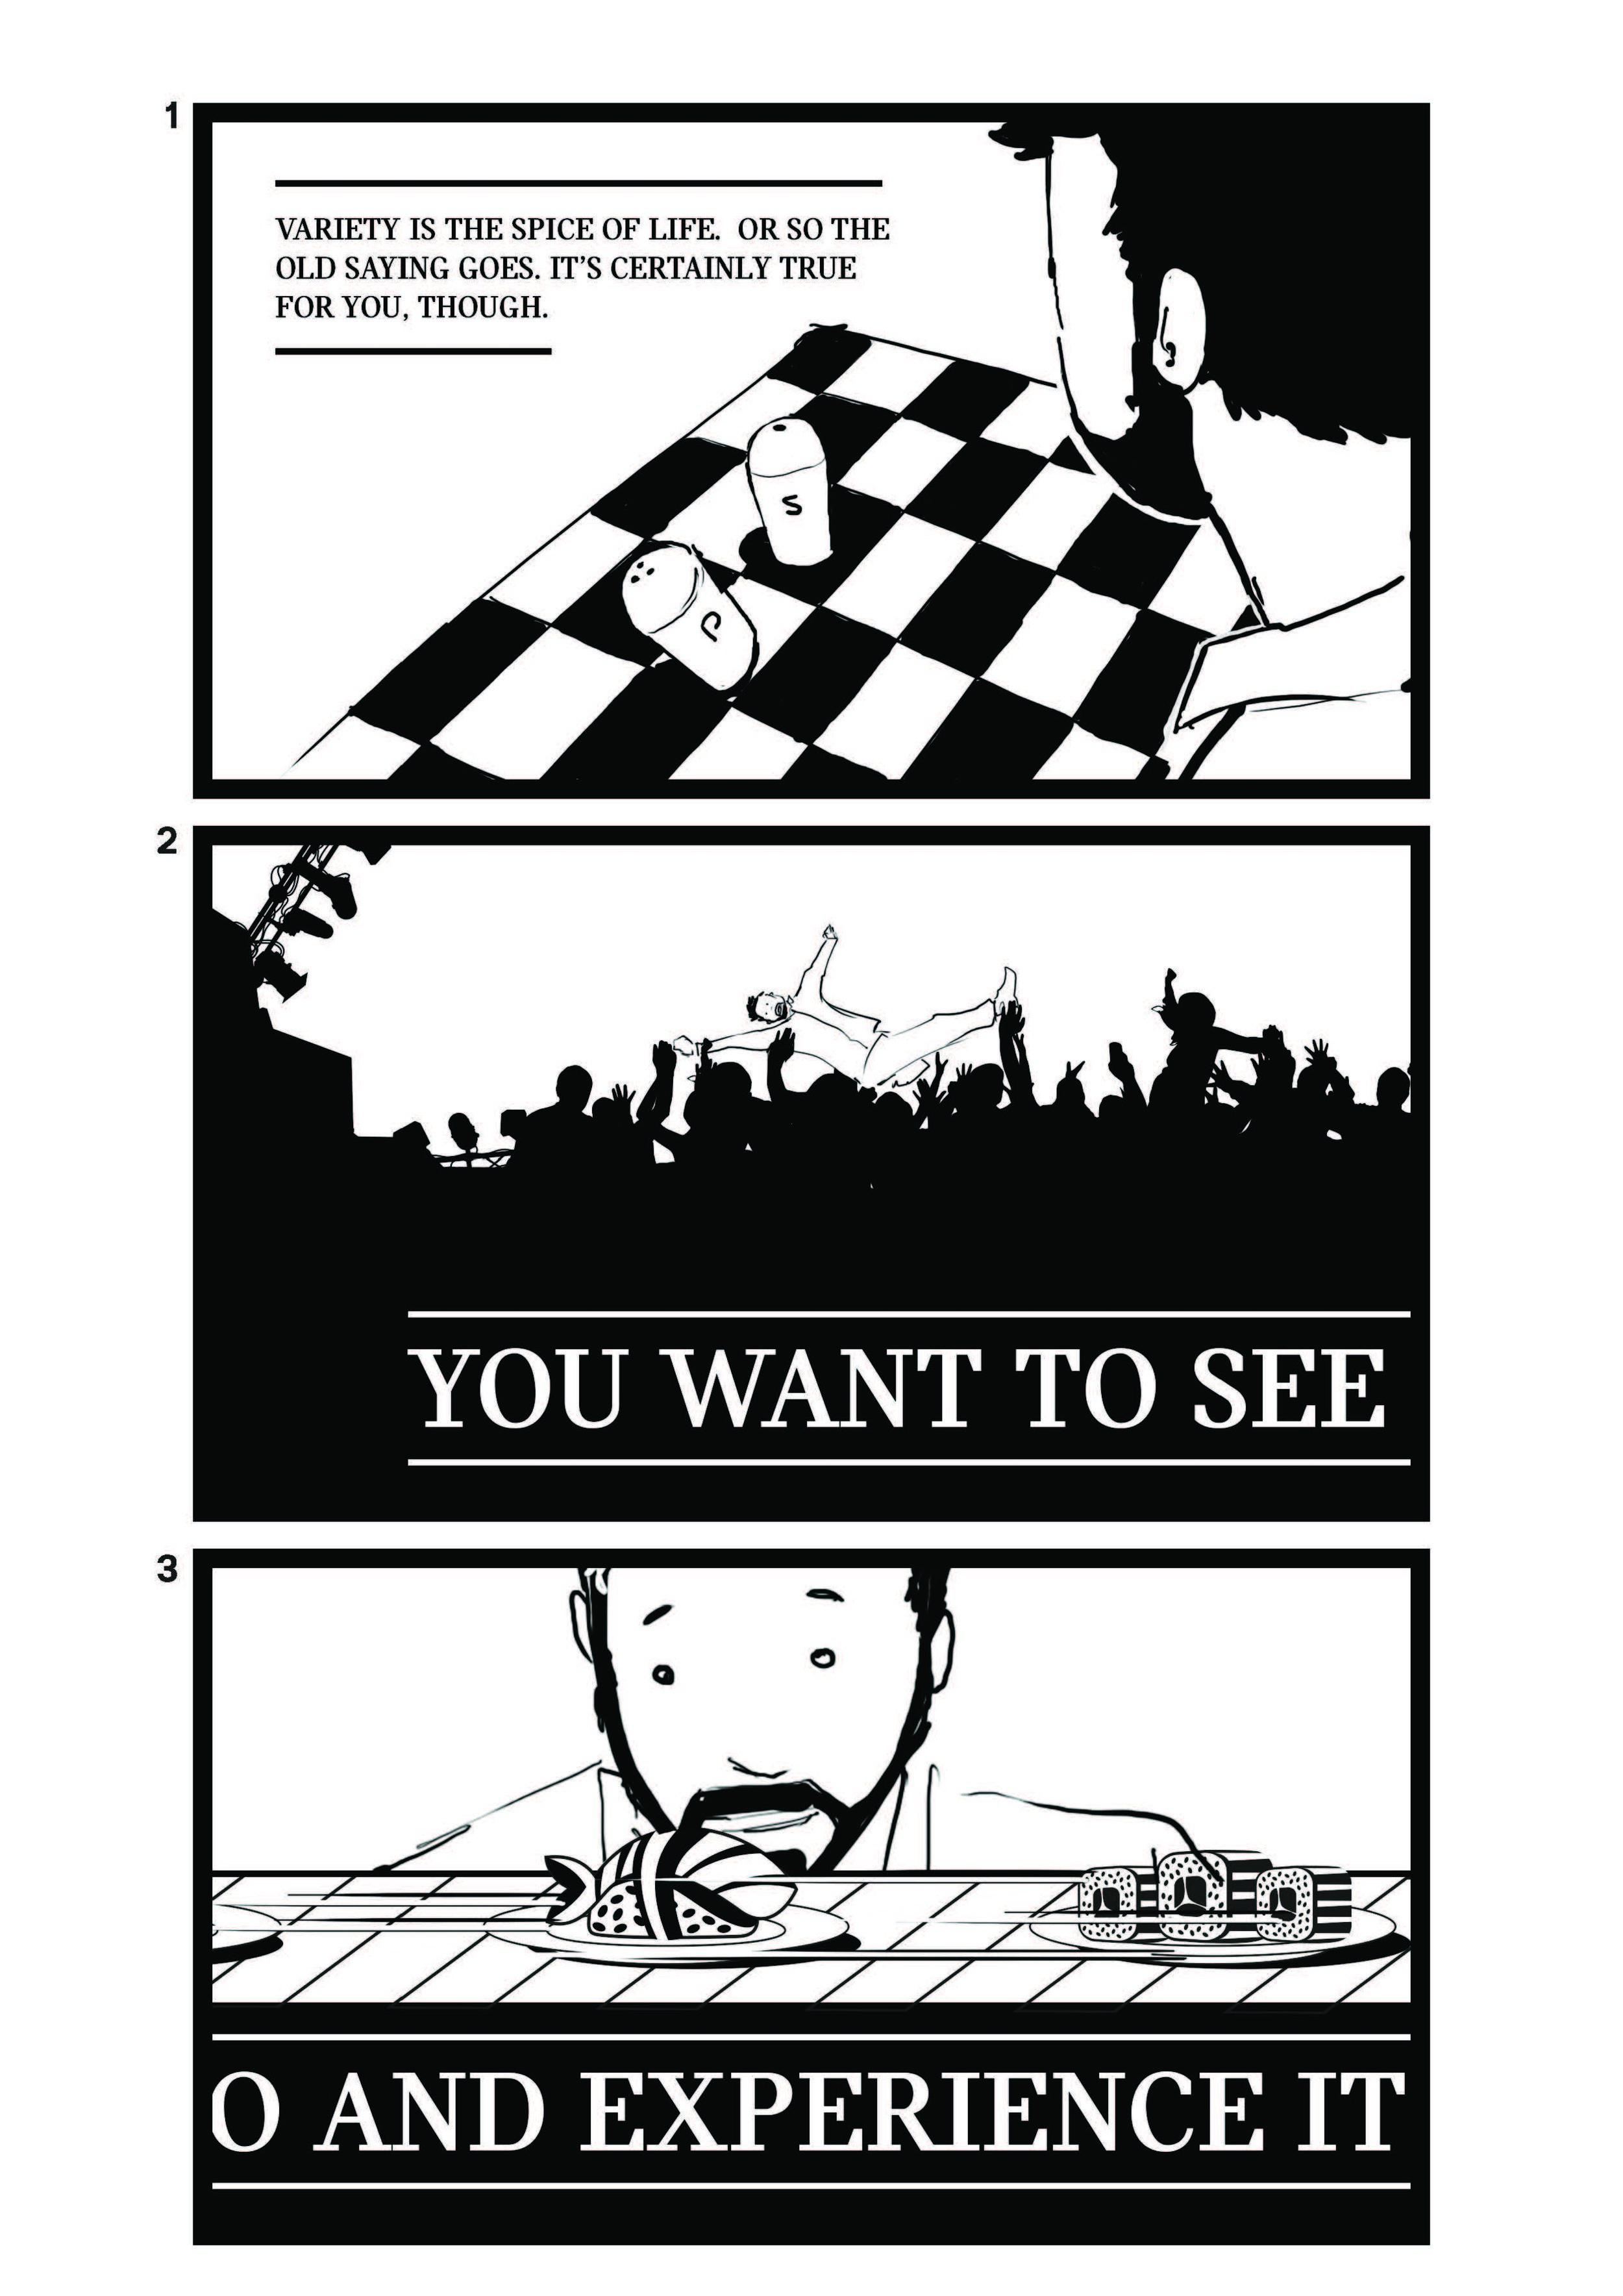 Storyboard_MINI_leasing_v4_final_Page_3.jpg